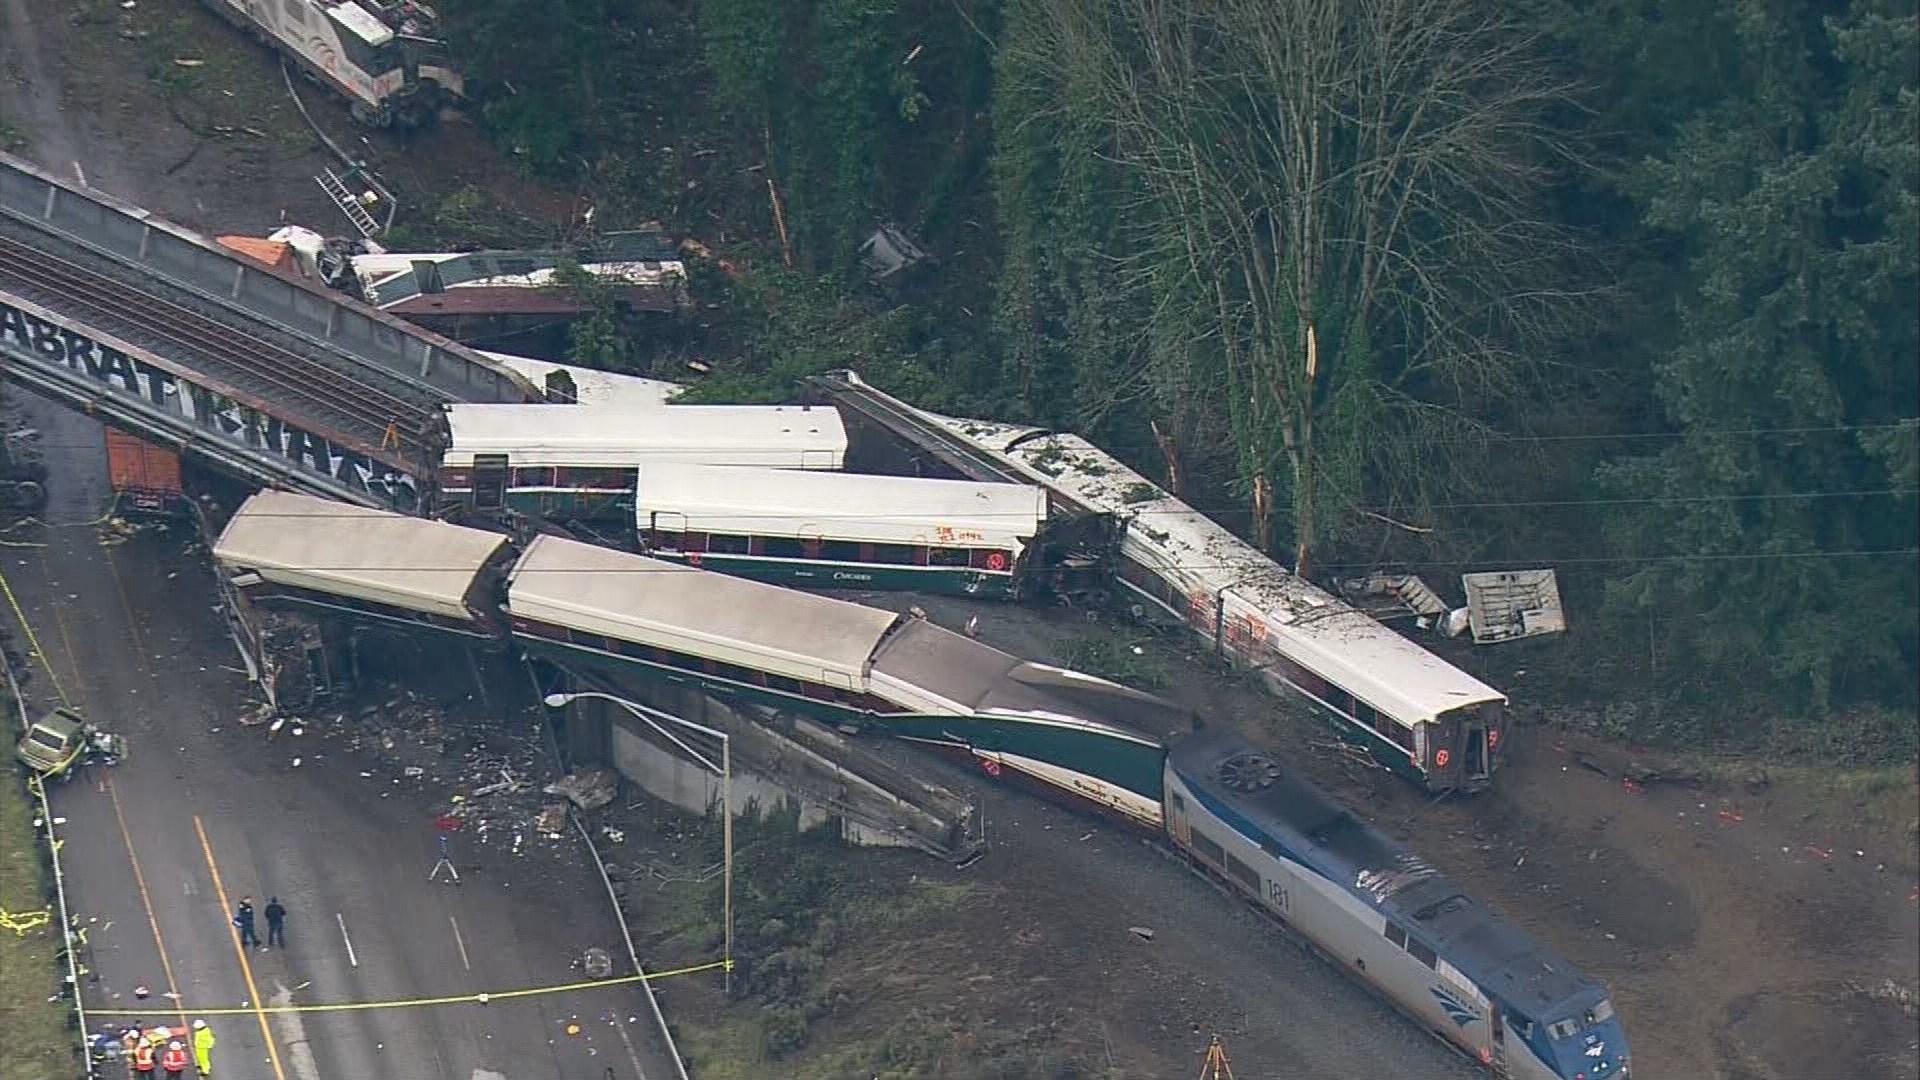 Spokane First Responders Discuss Plan For Train Derailment